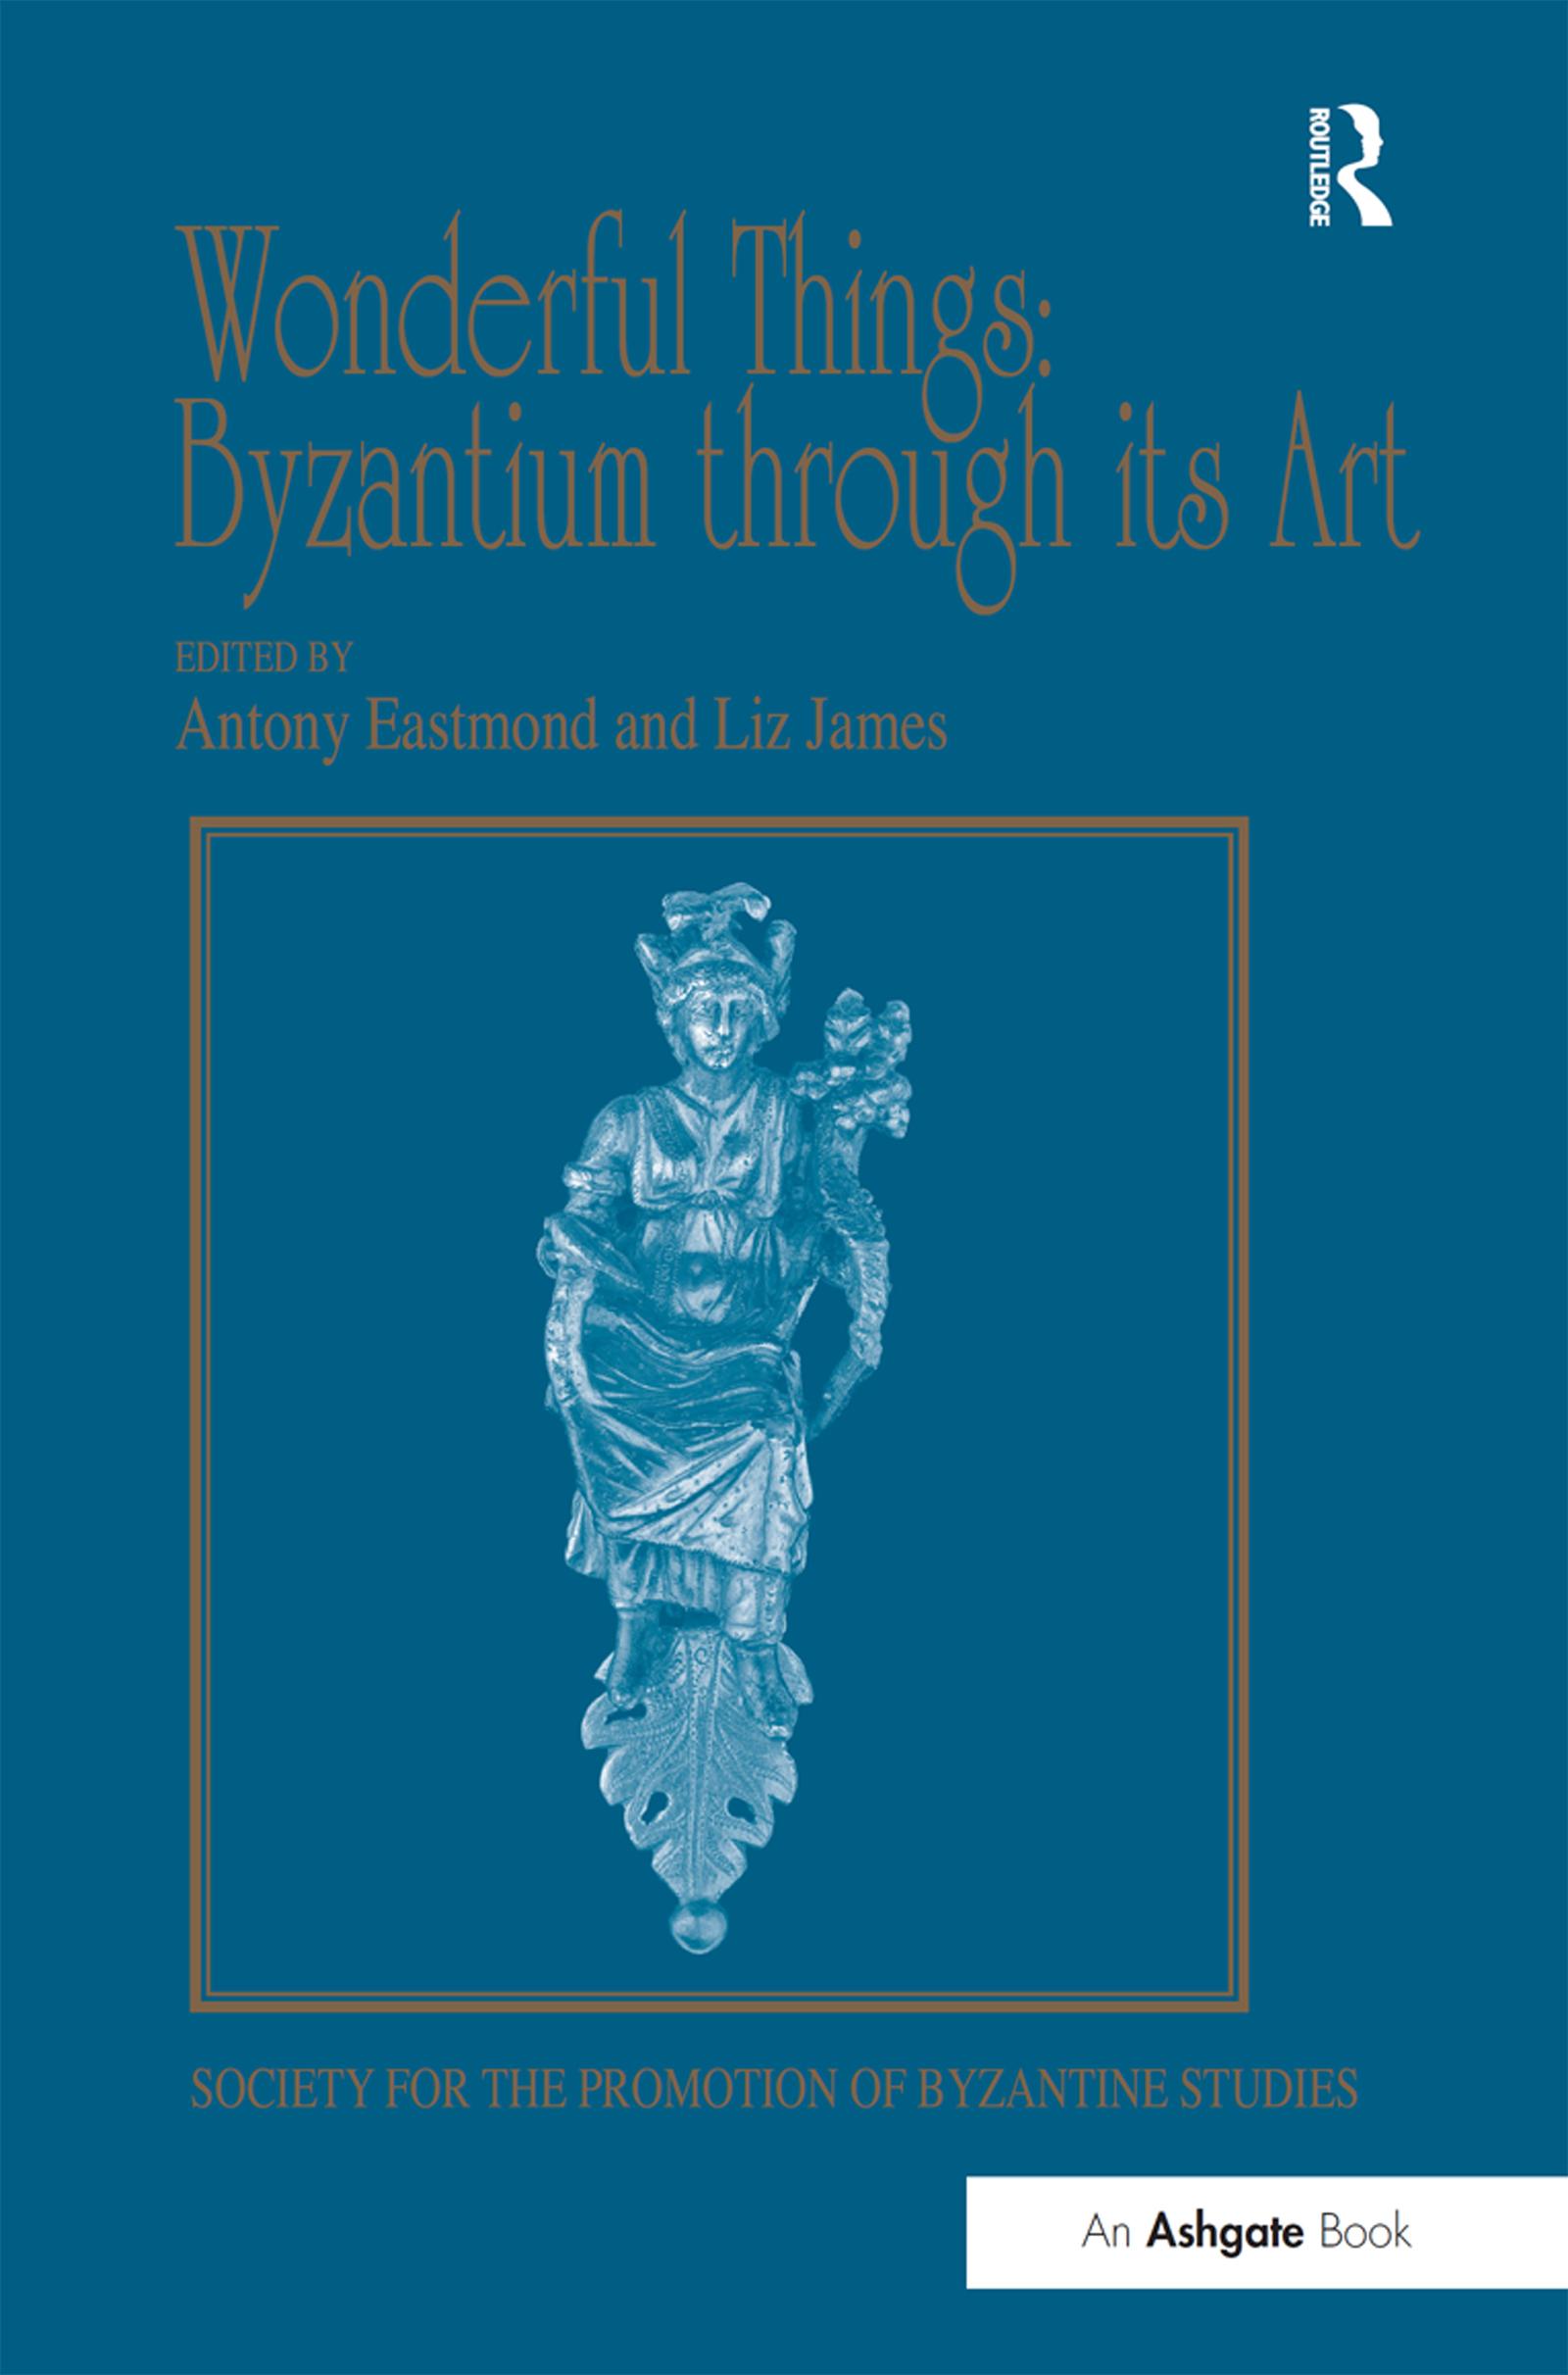 Wonderful Things: Byzantium through its Art